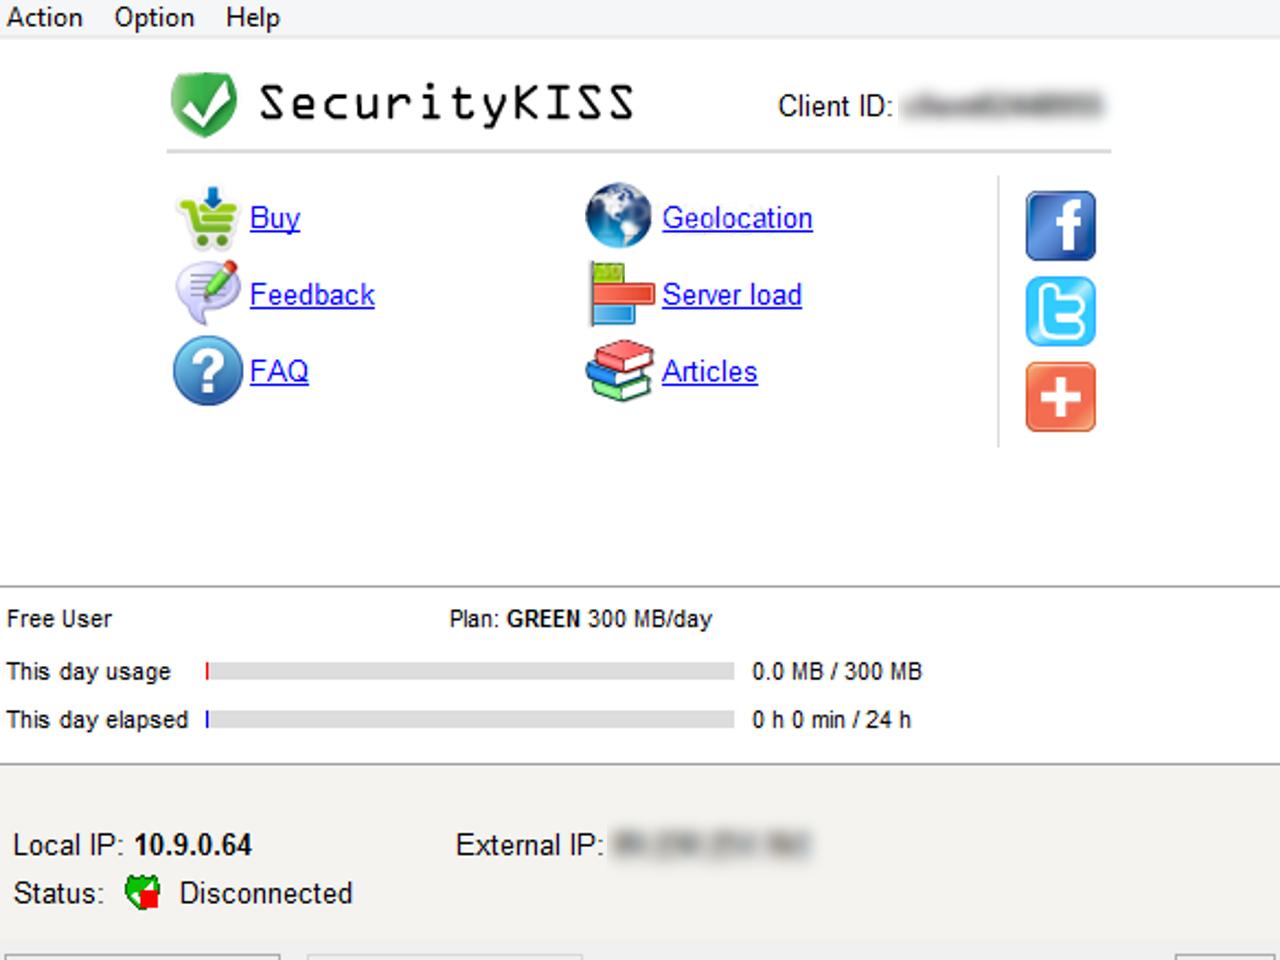 Best Free VPN According to Reddit